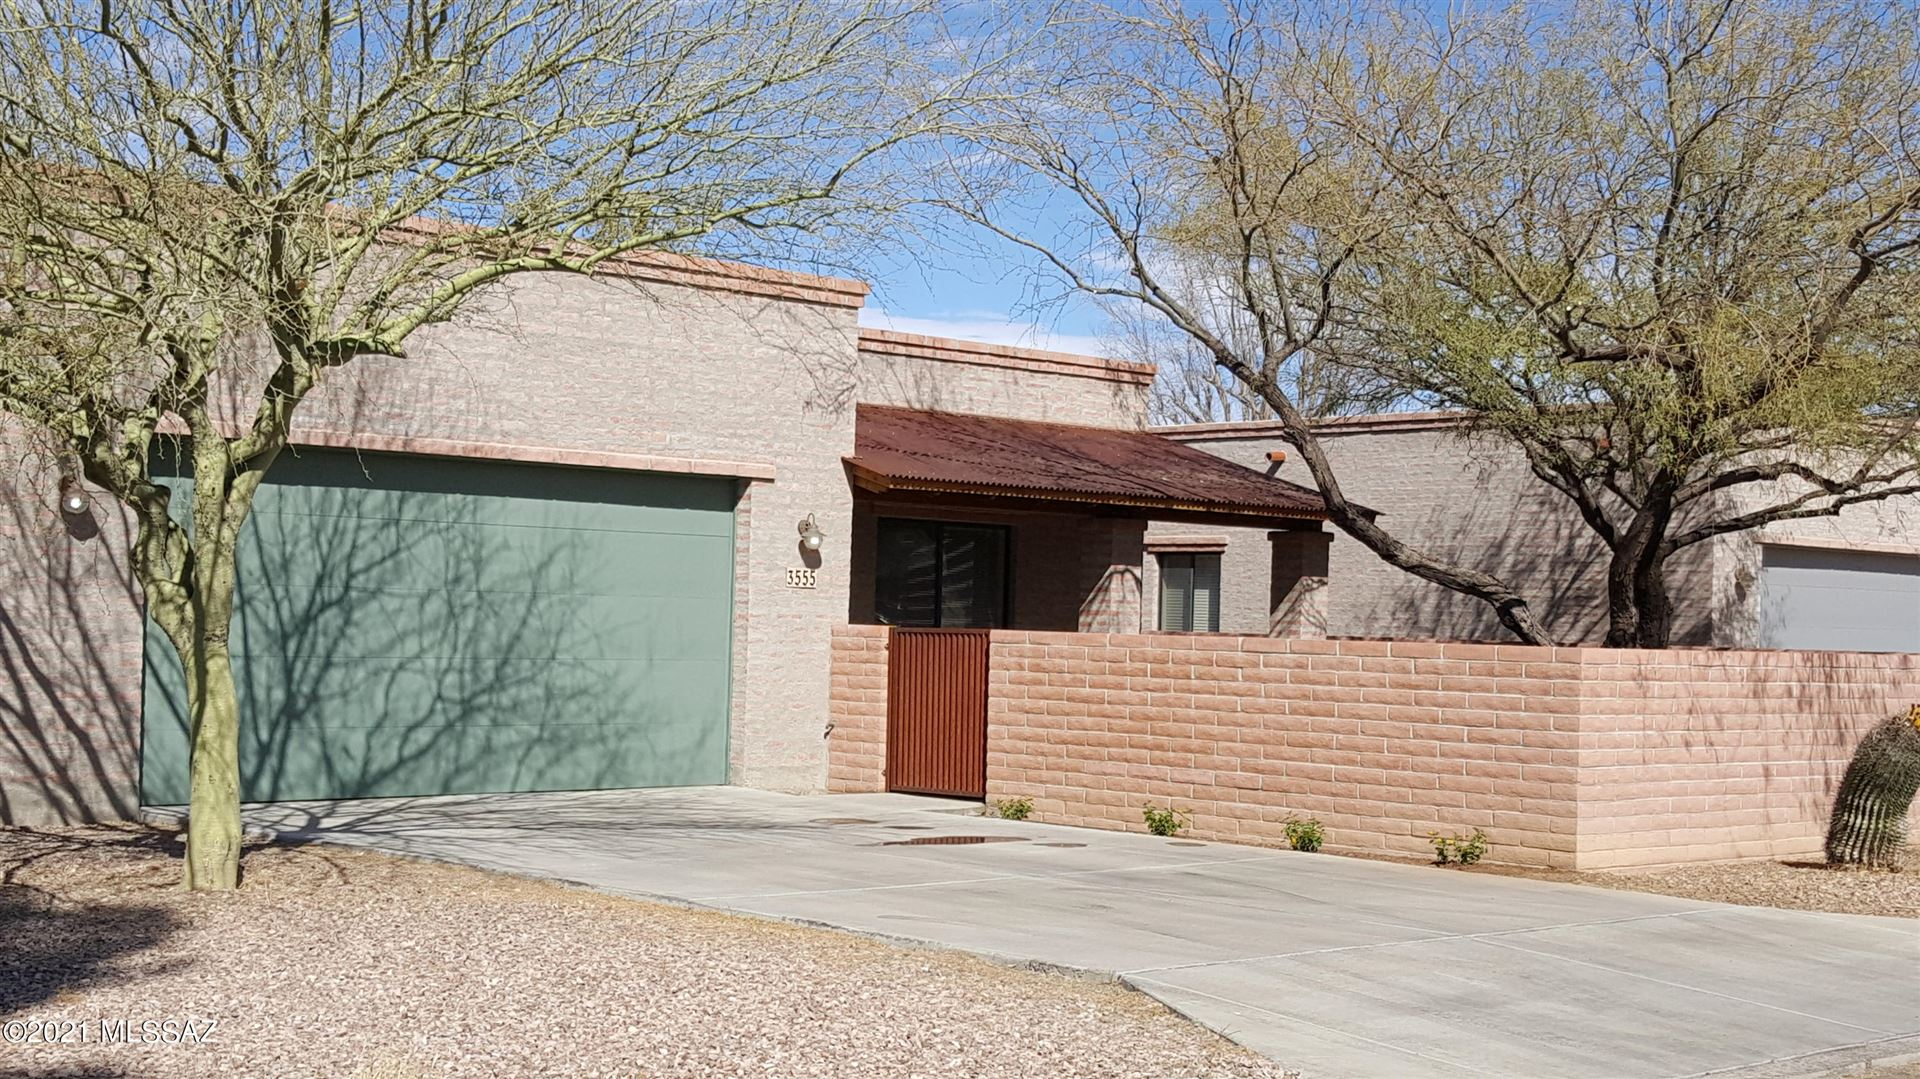 3555 E Edison Street, Tucson, AZ 85716 - MLS#: 22104652